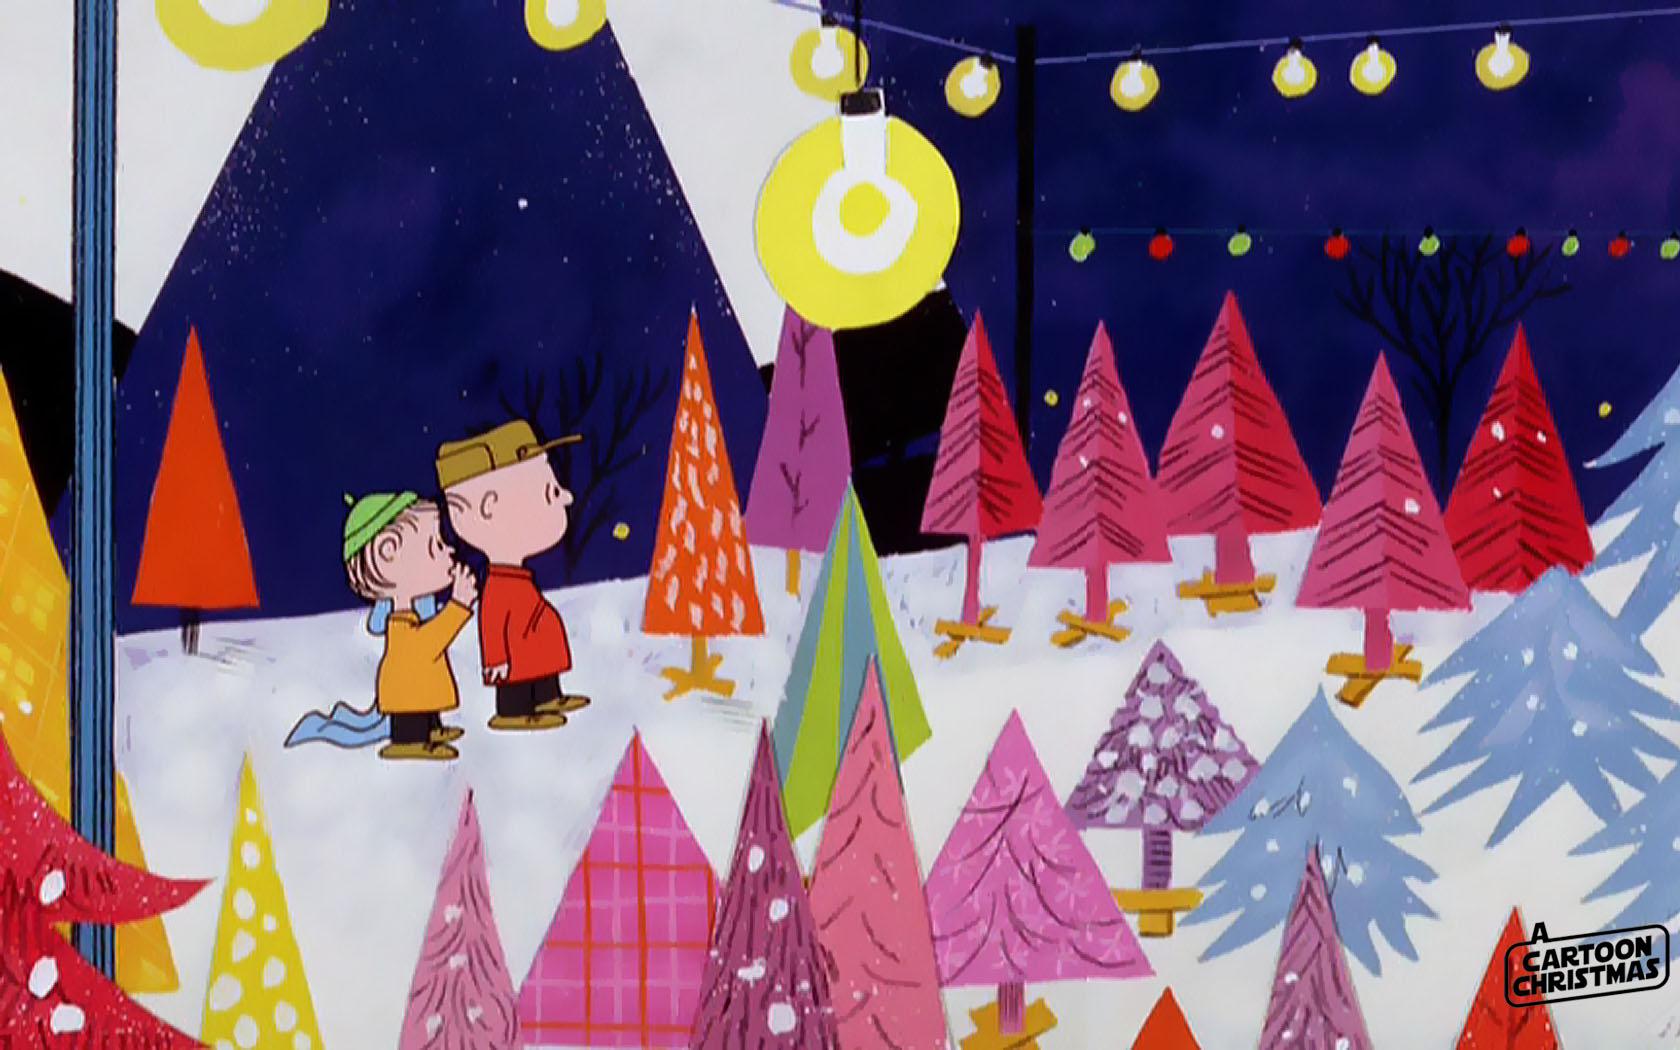 Peanuts Thanksgiving Wallpaper 1680—1050 - Charlie Brown Christmas Christmas Tree Lot - HD Wallpaper